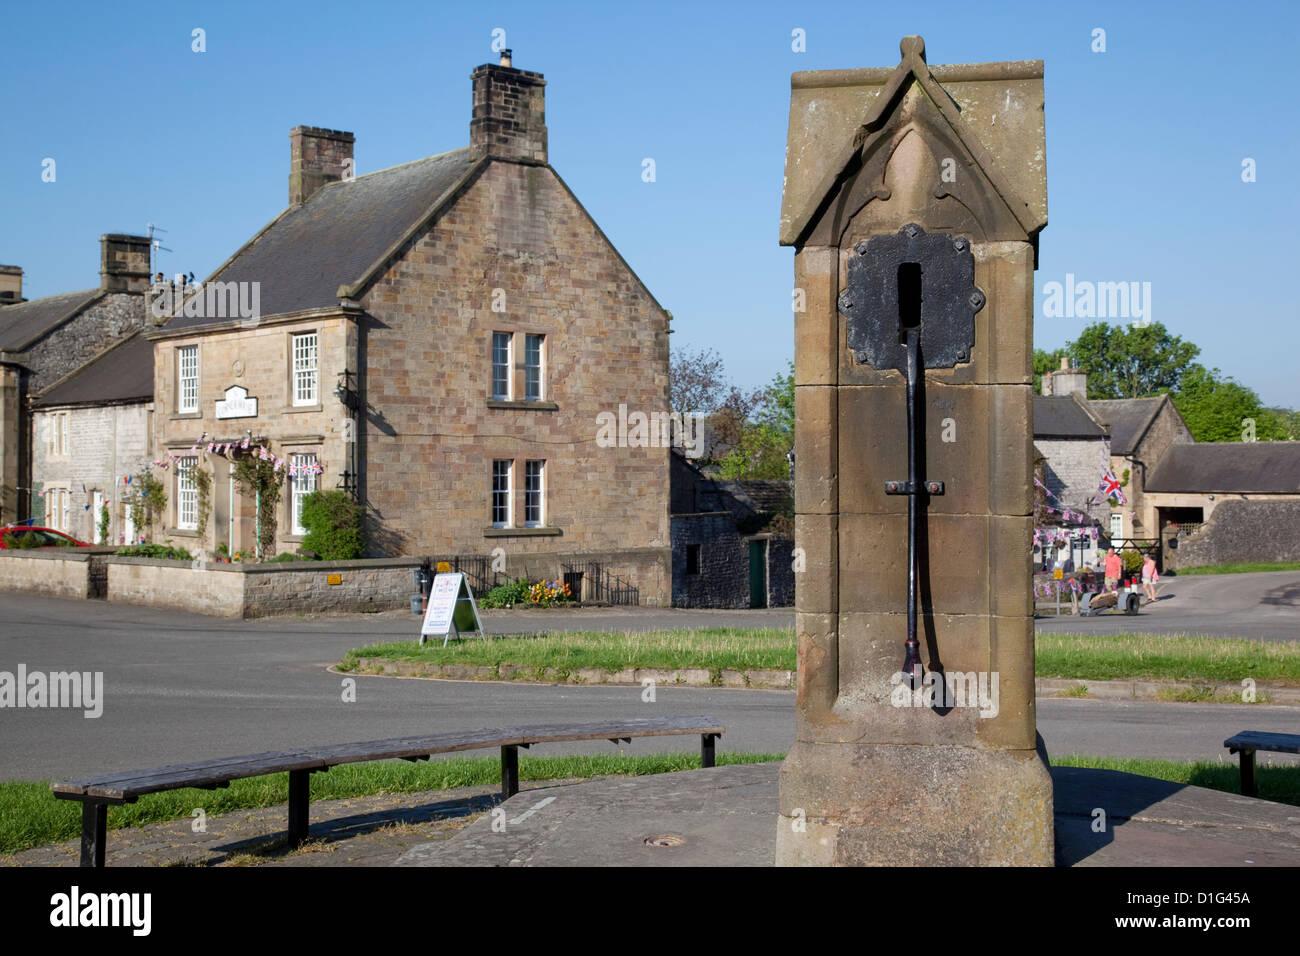 Village well, Hartington, Peak District, Derbyshire, England, United Kingdom, Europe - Stock Image